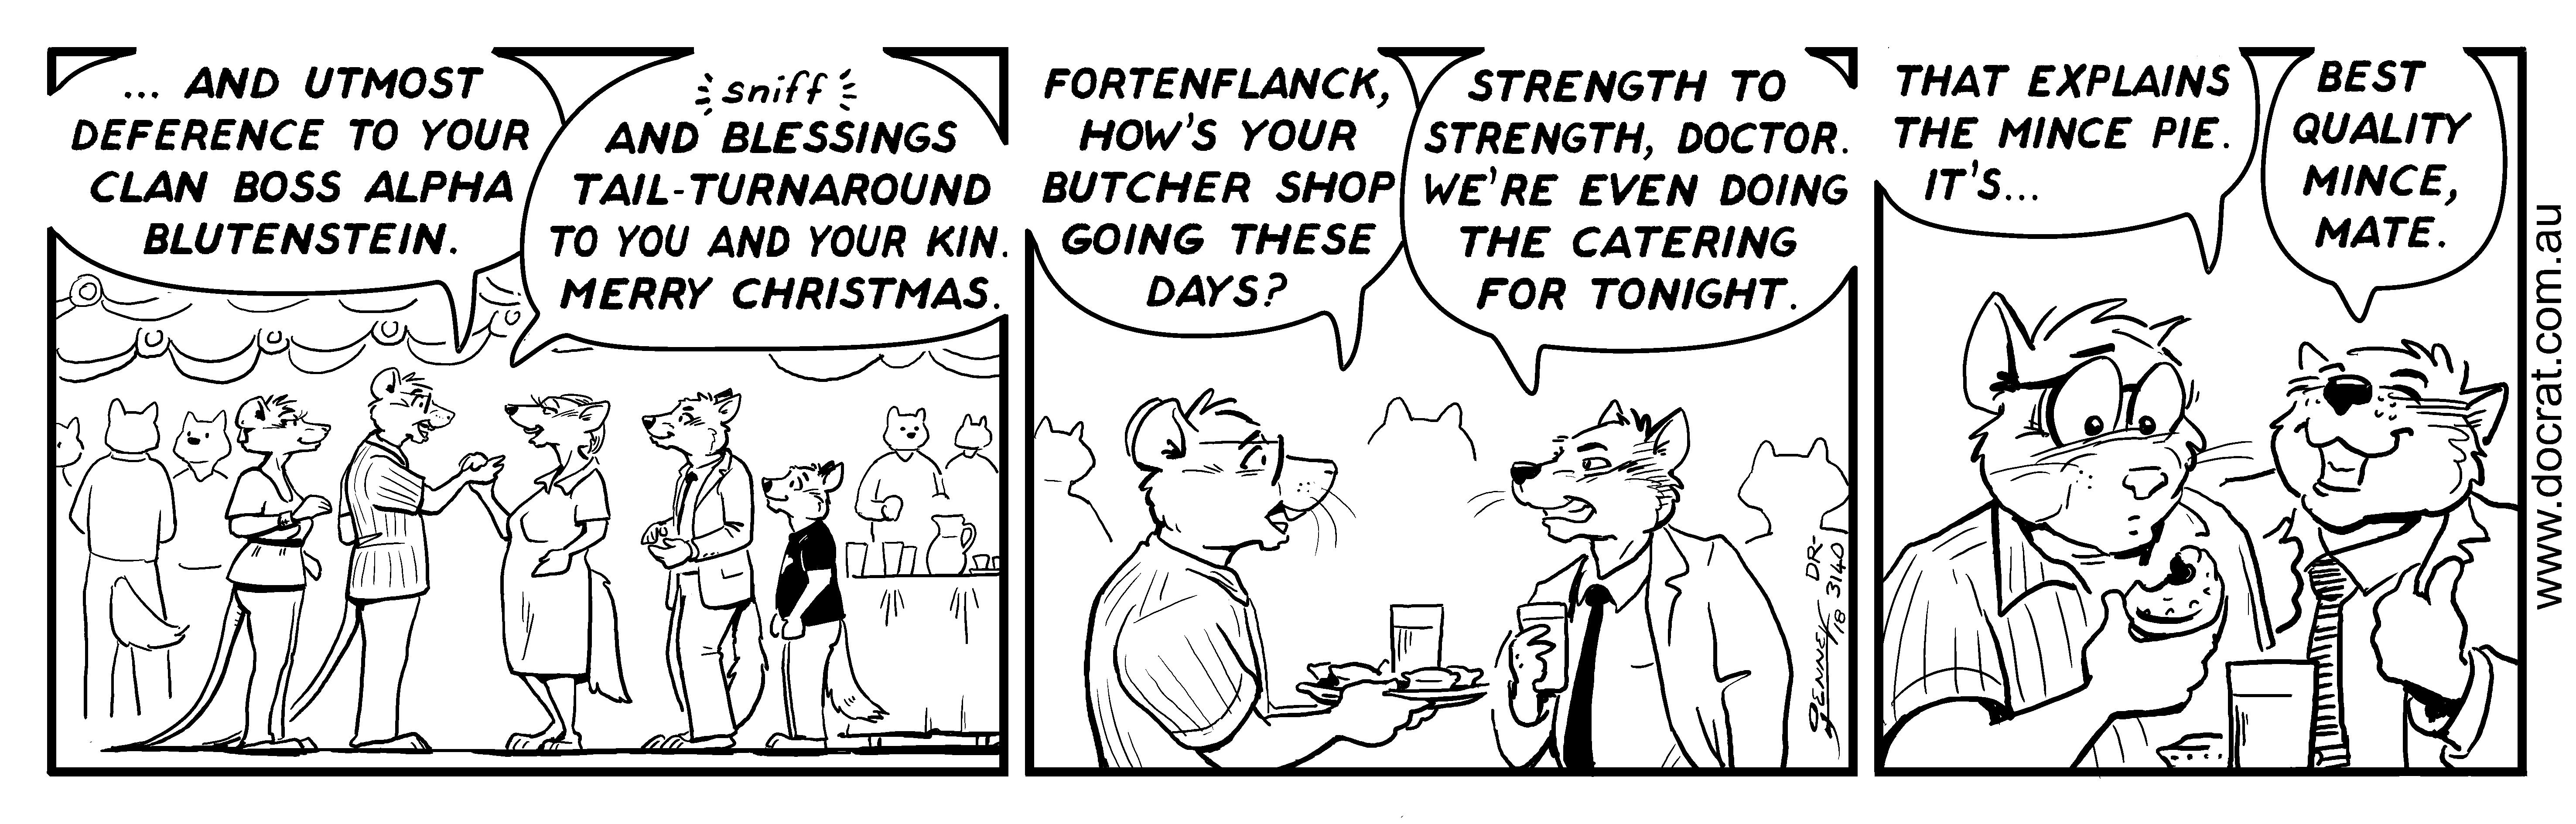 20181221